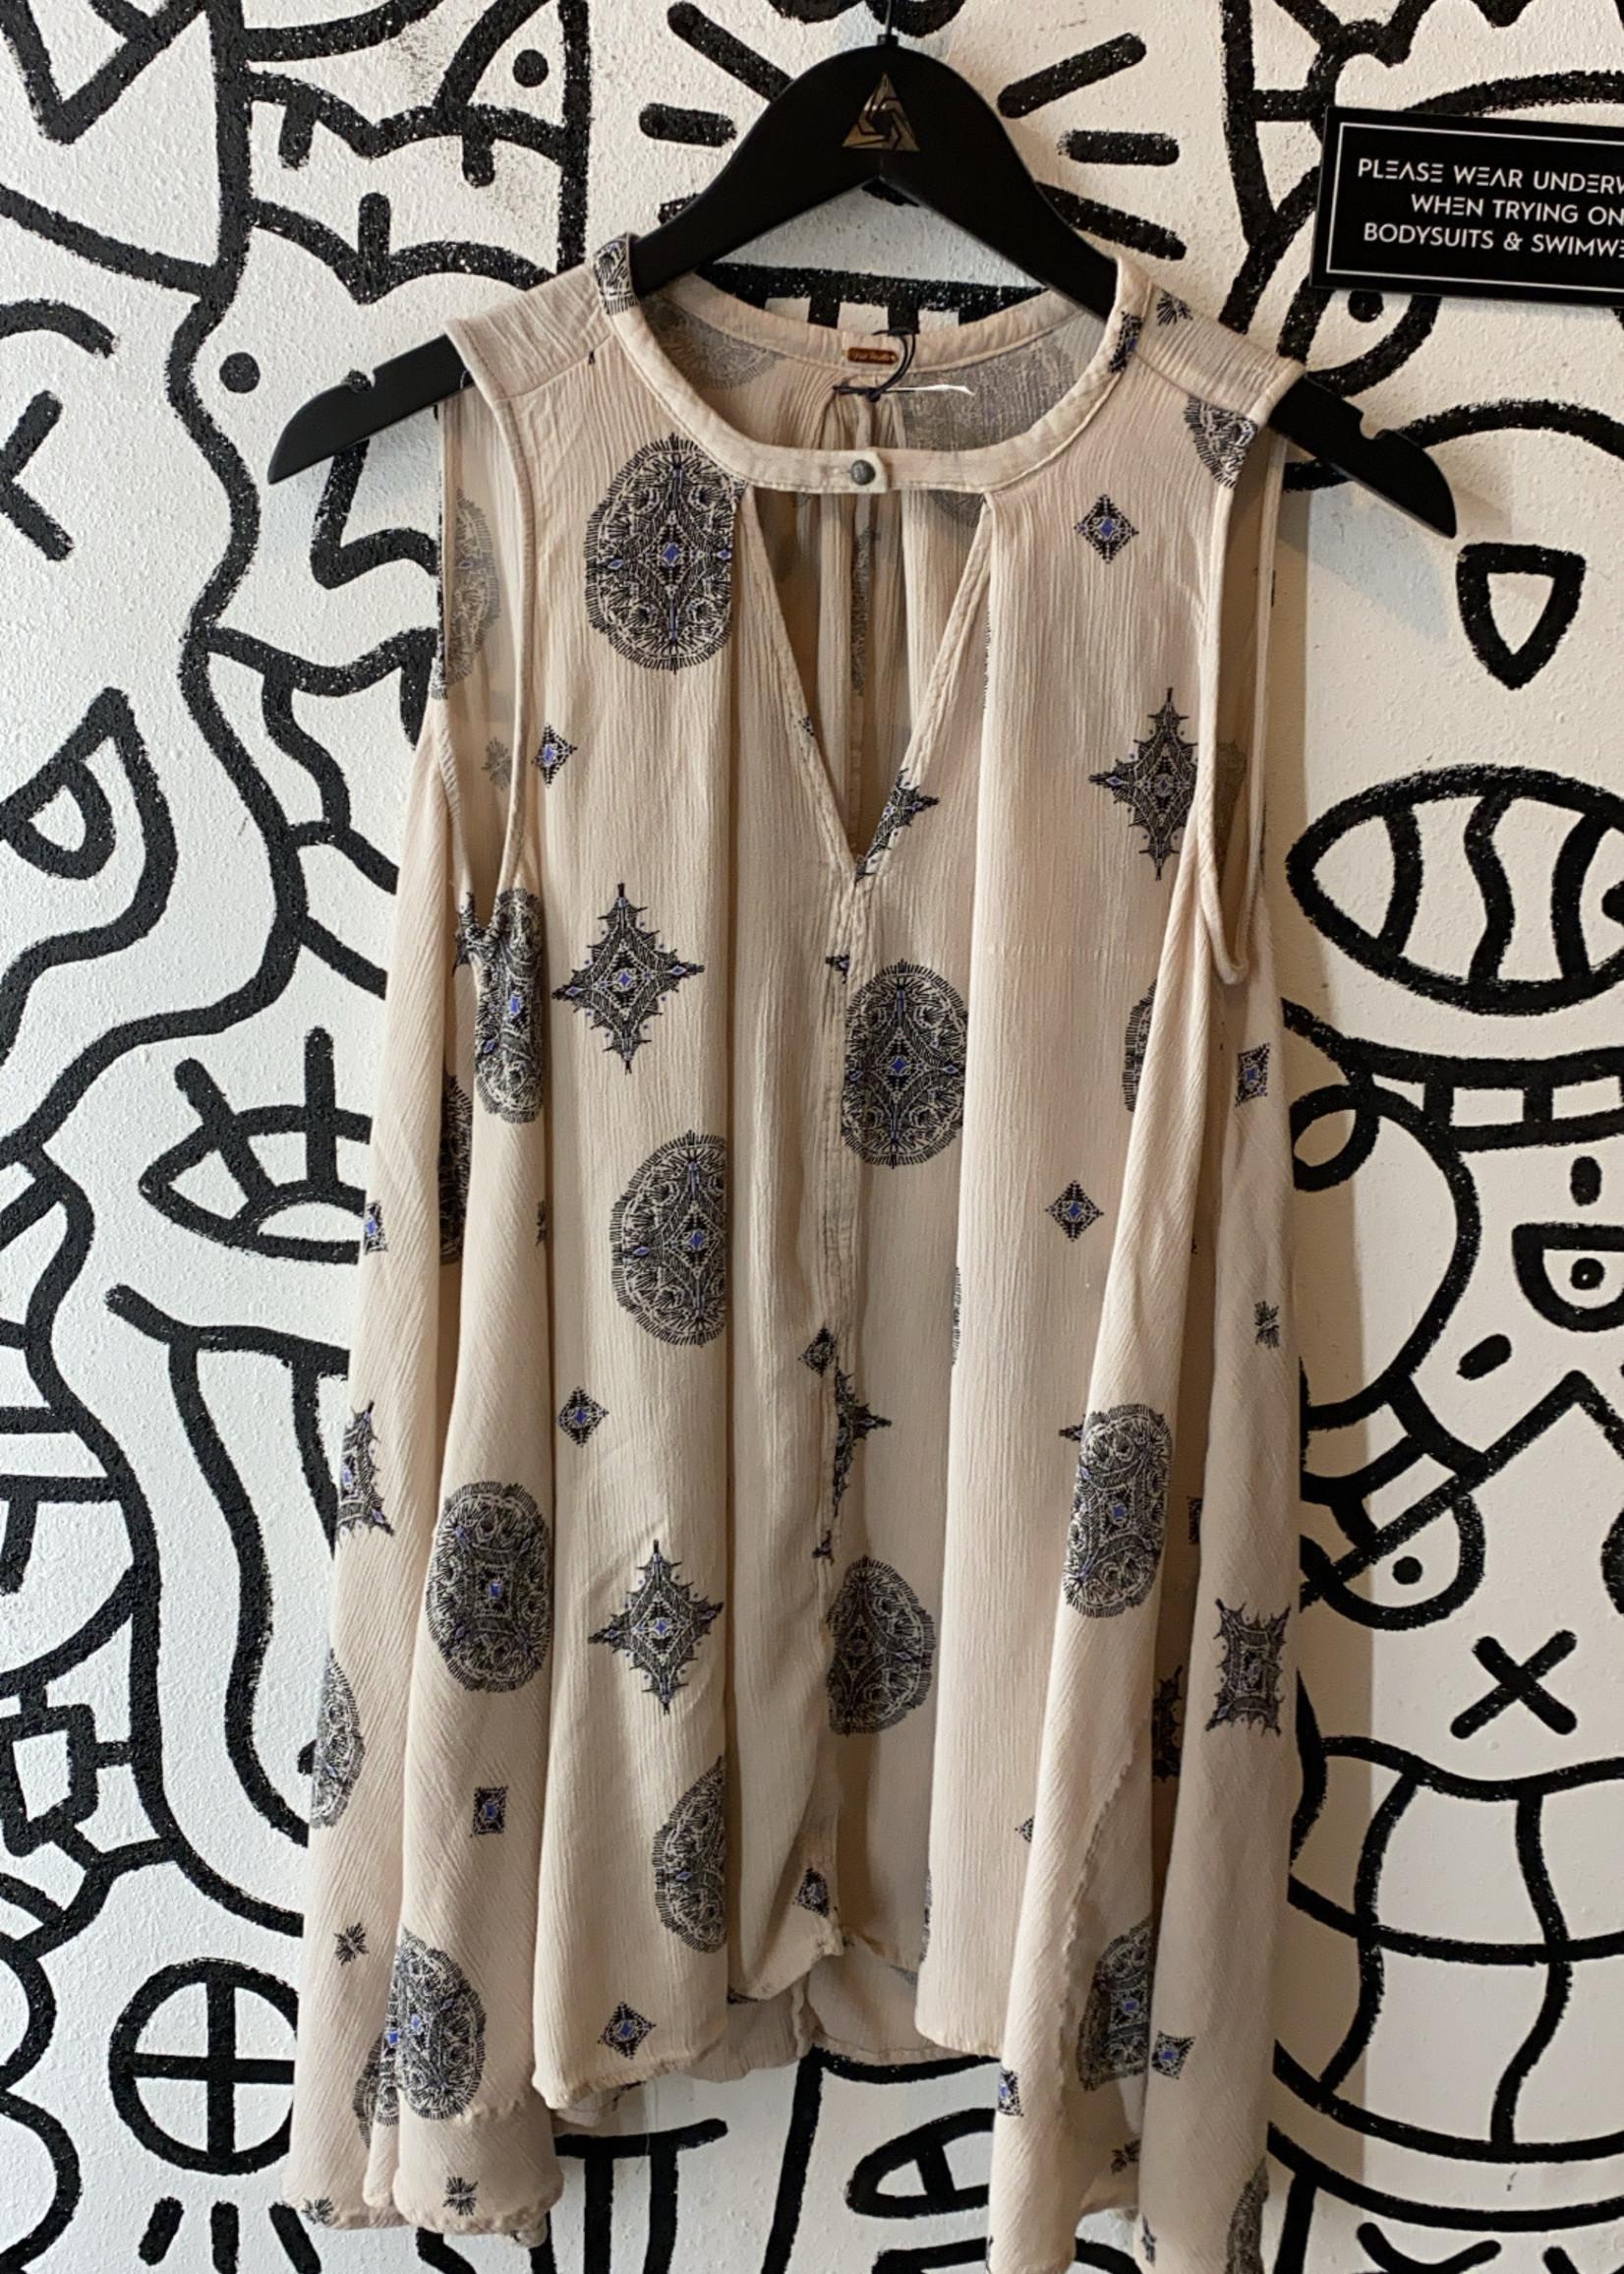 Free people v neck tank top dress tan design S